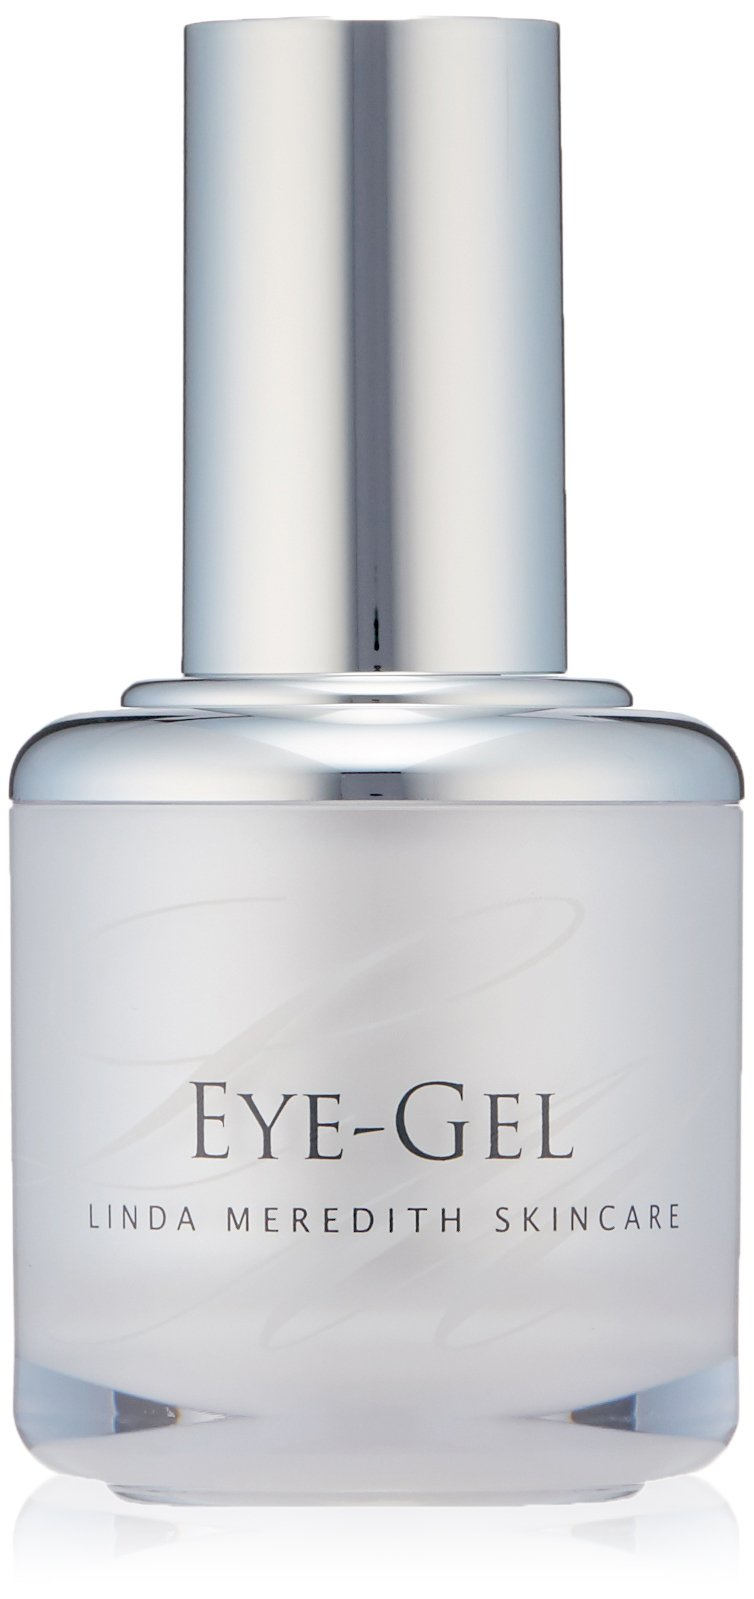 Linda Meredith Skin Care Eye Gel, 30 fl. oz. by Linda Meredith Skin Care